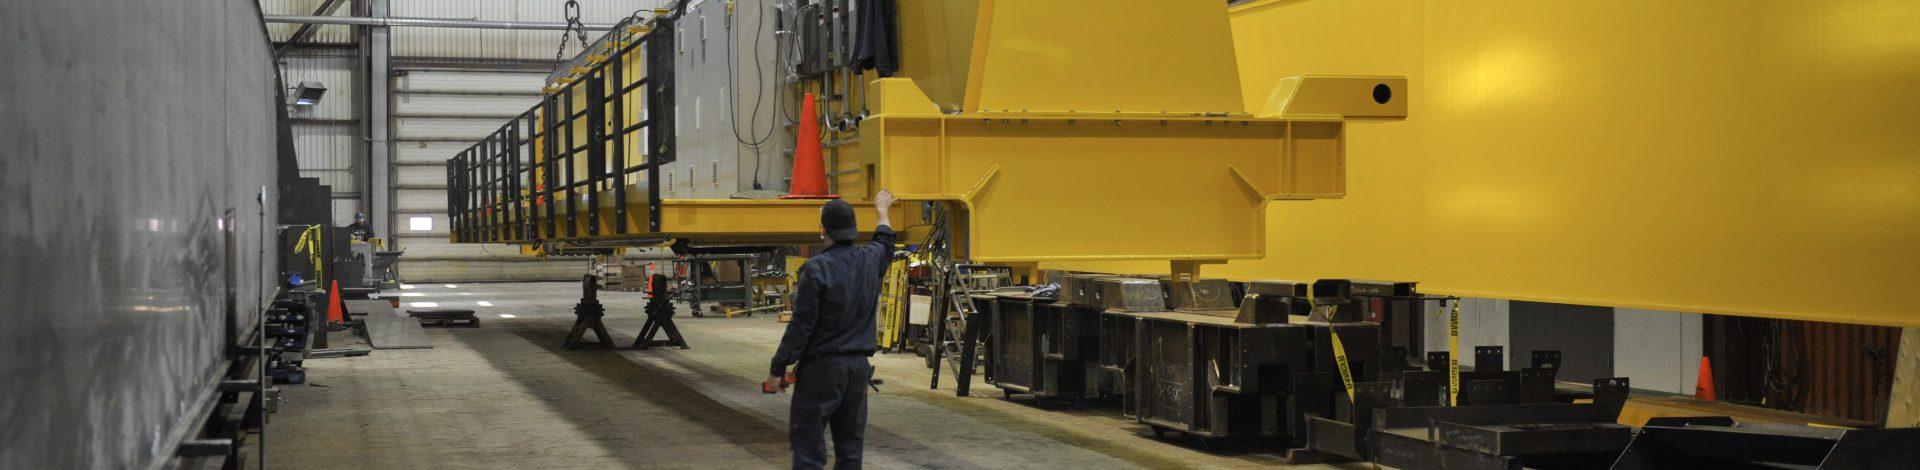 manufacturing-overheadcrane